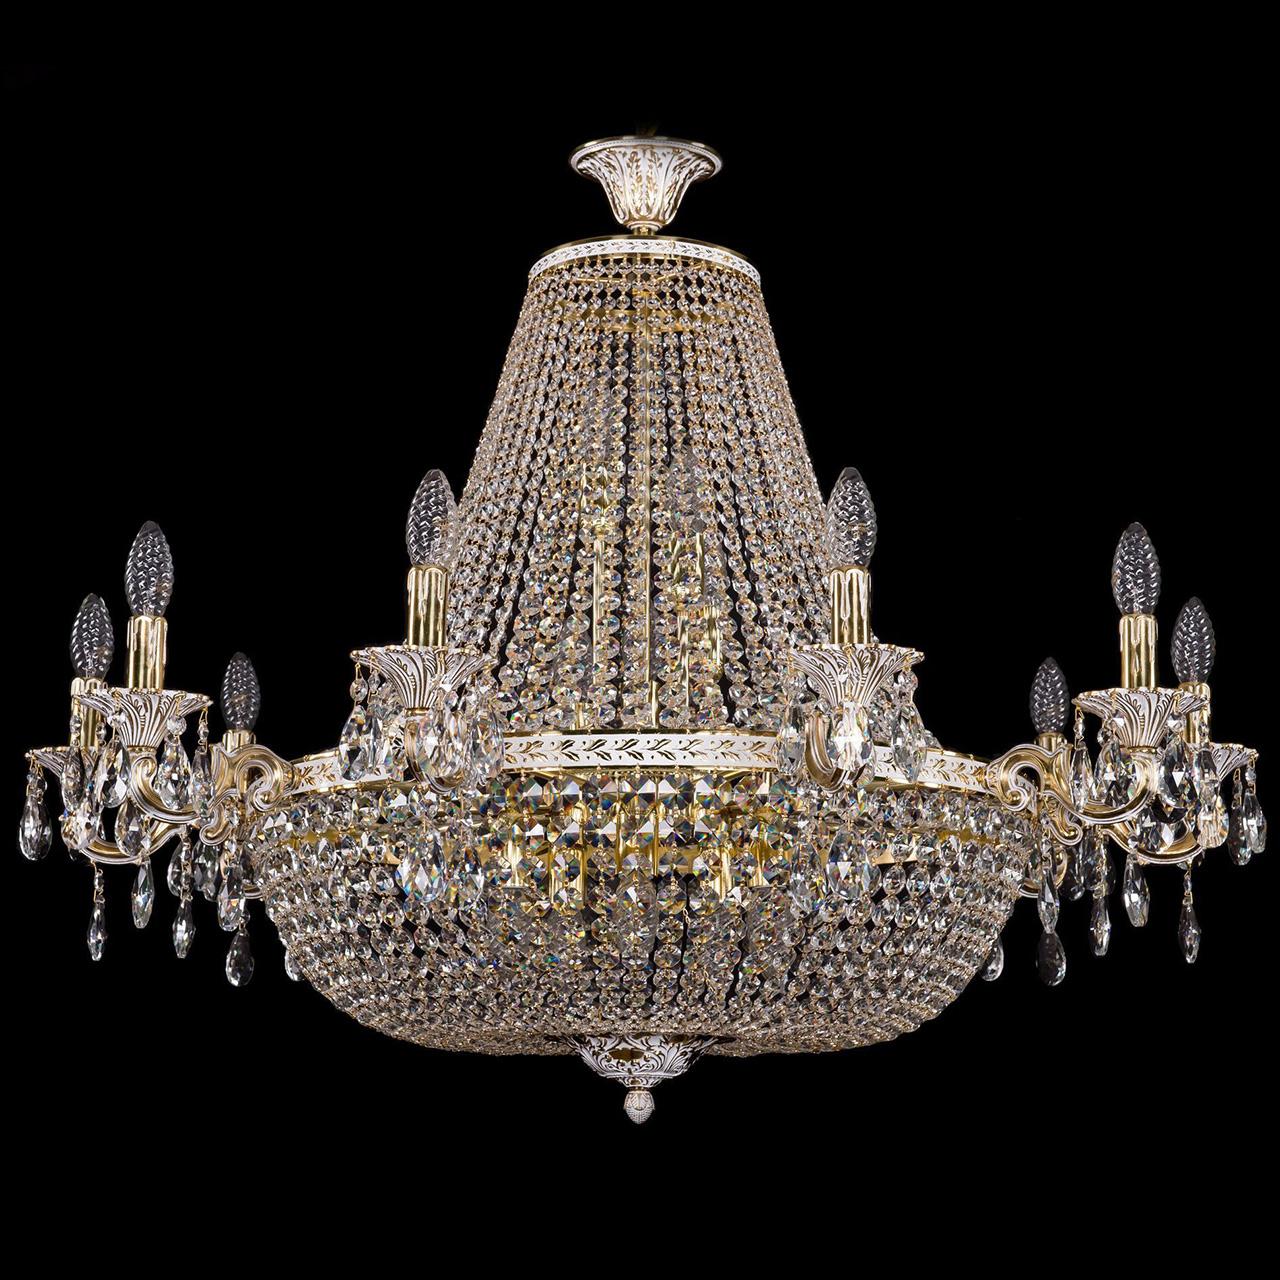 Люстра Bohemia Ivele Crystal золото беленое 2022/95-70 люстра bohemia ivele crystal золото беленое 1702 10 335a